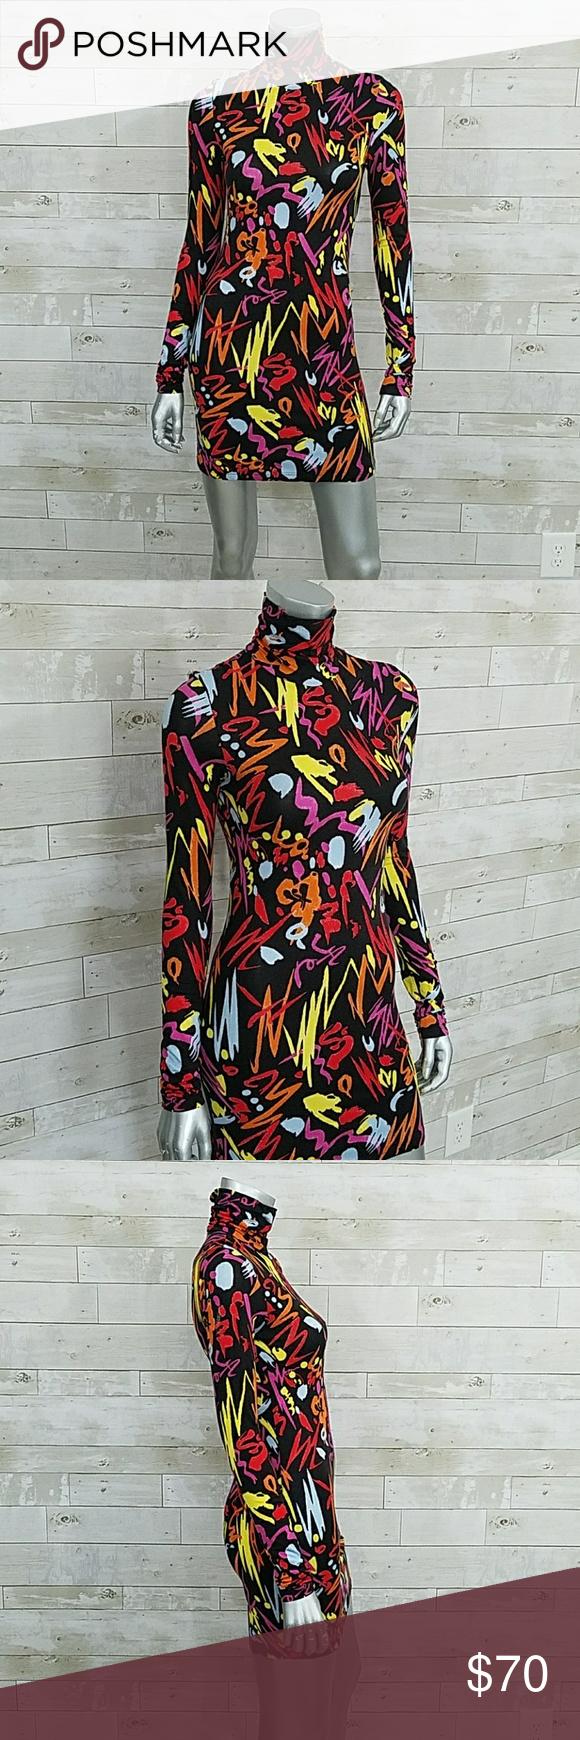 Versace abstract long sleeve turtleneck dress long sleeve